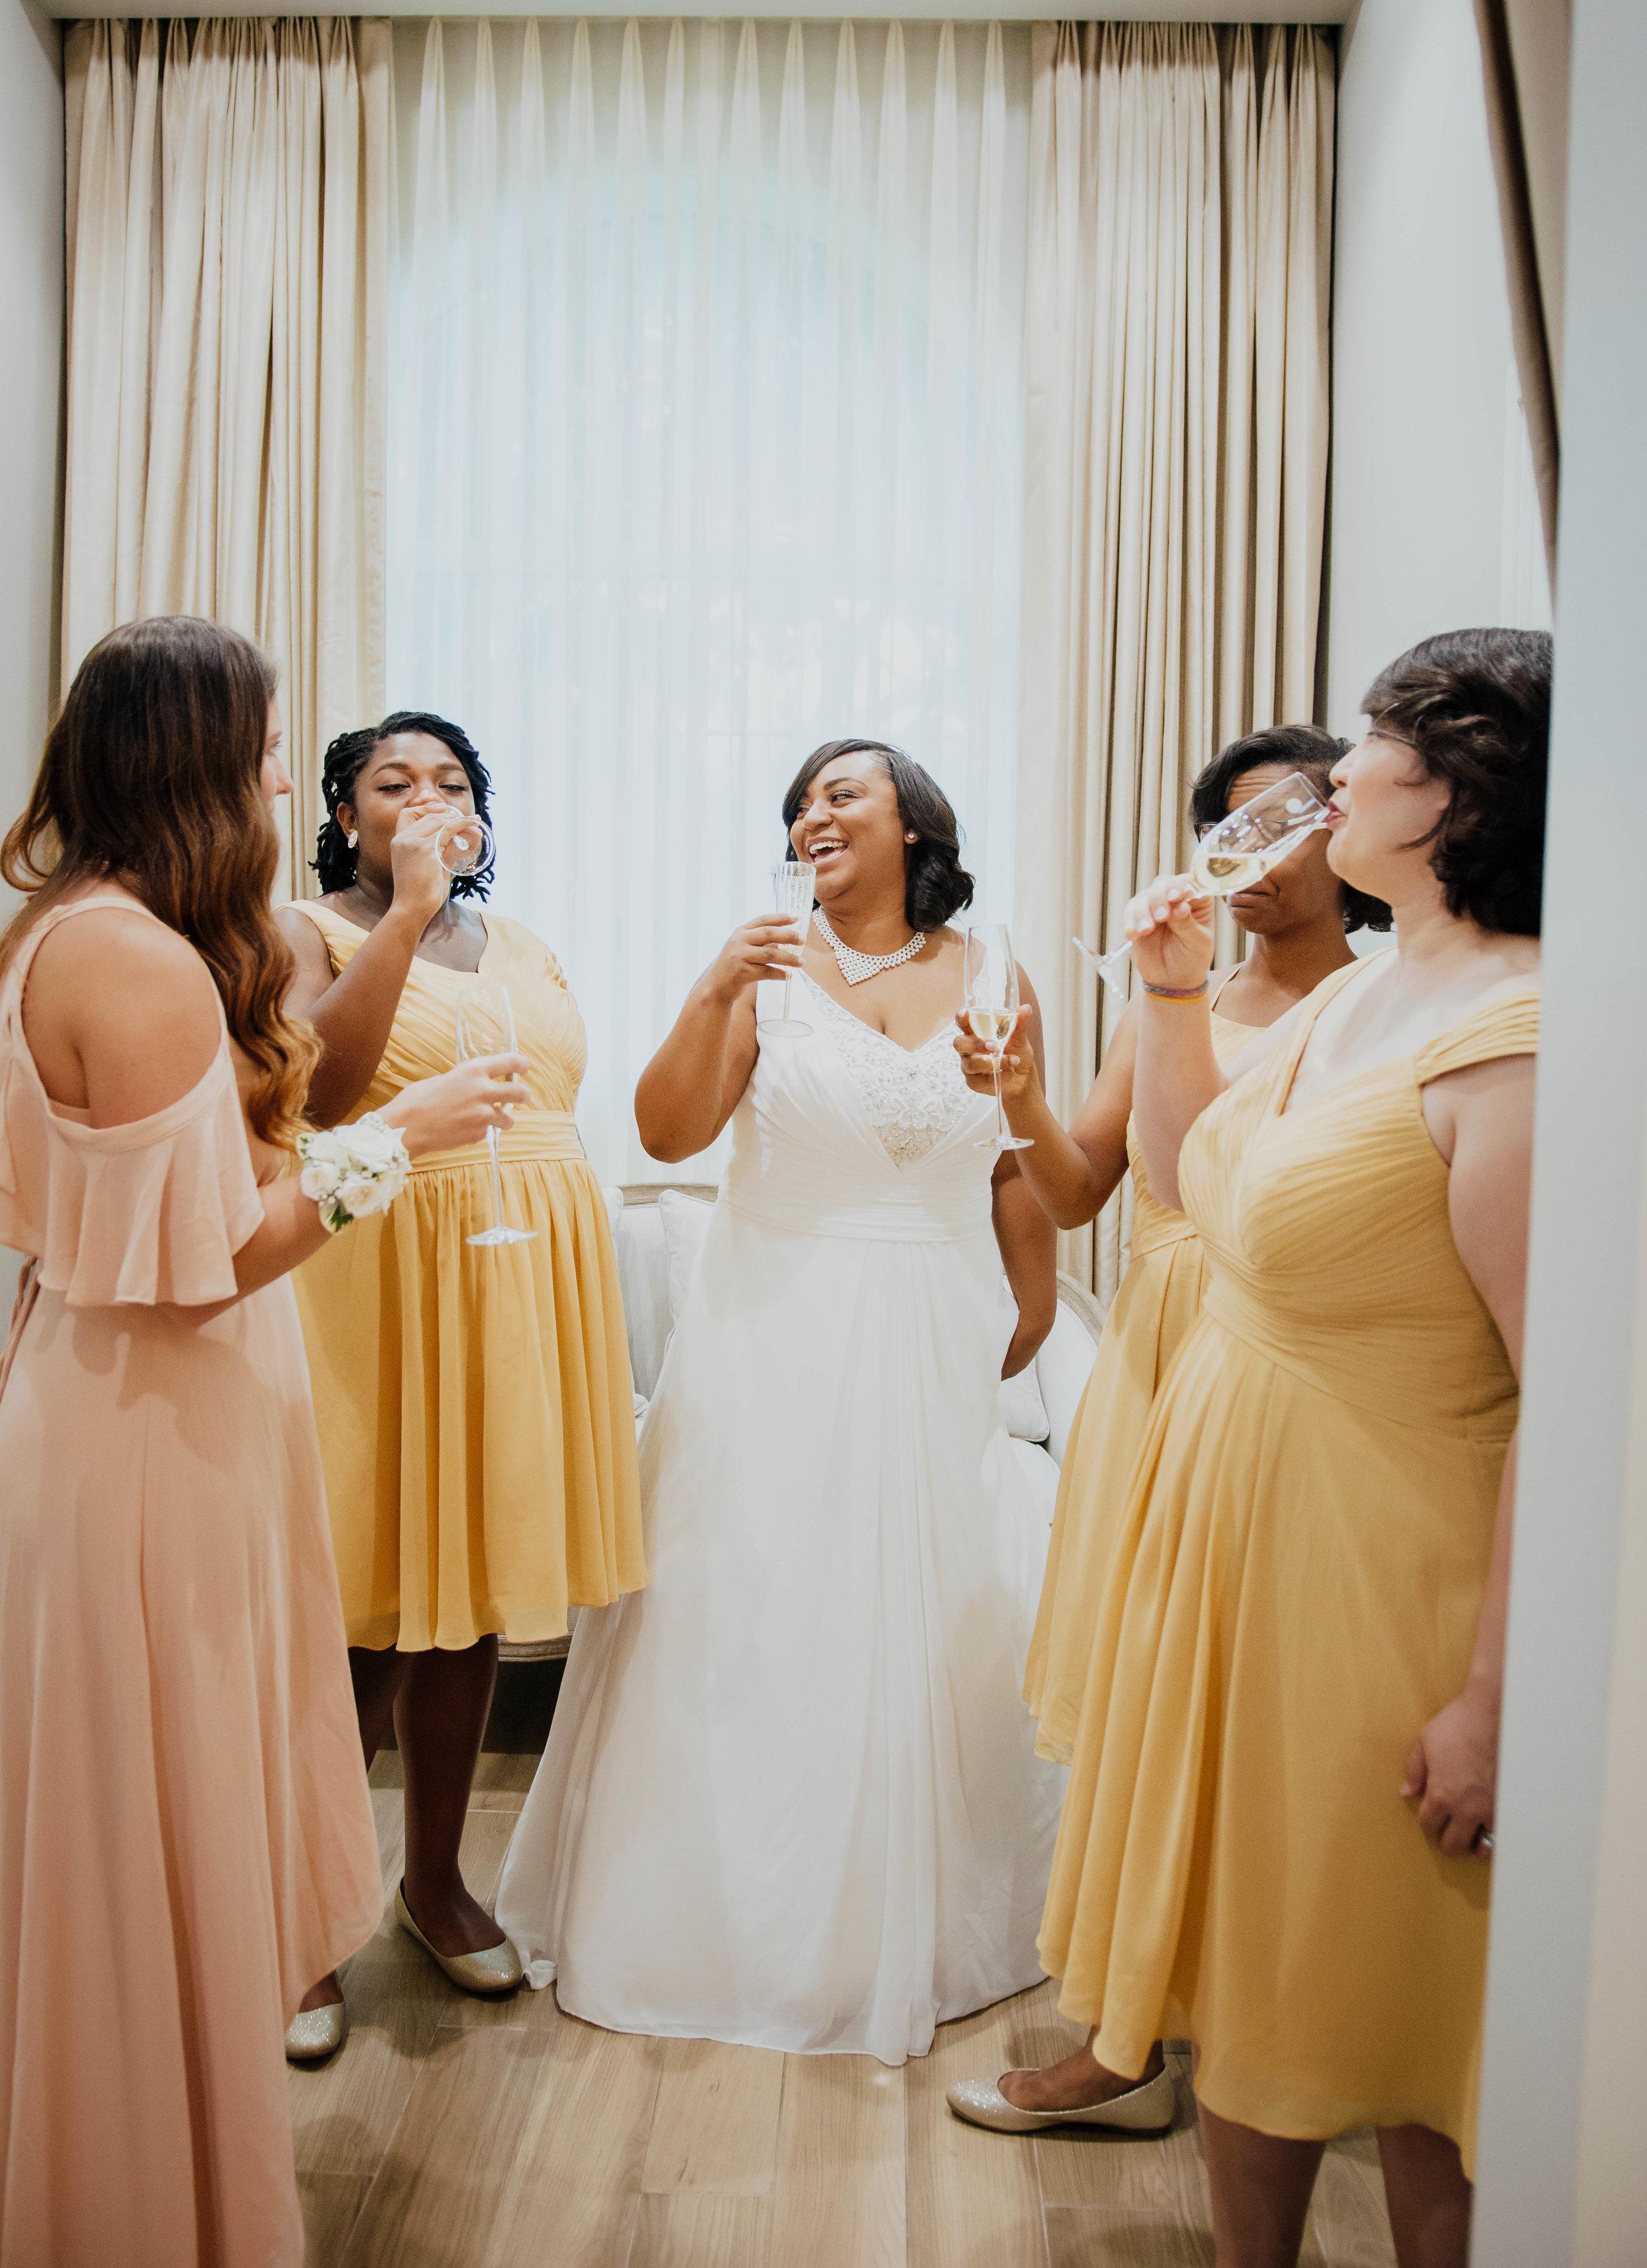 McNeile_Photography_Wedding_Tampa18.jpg